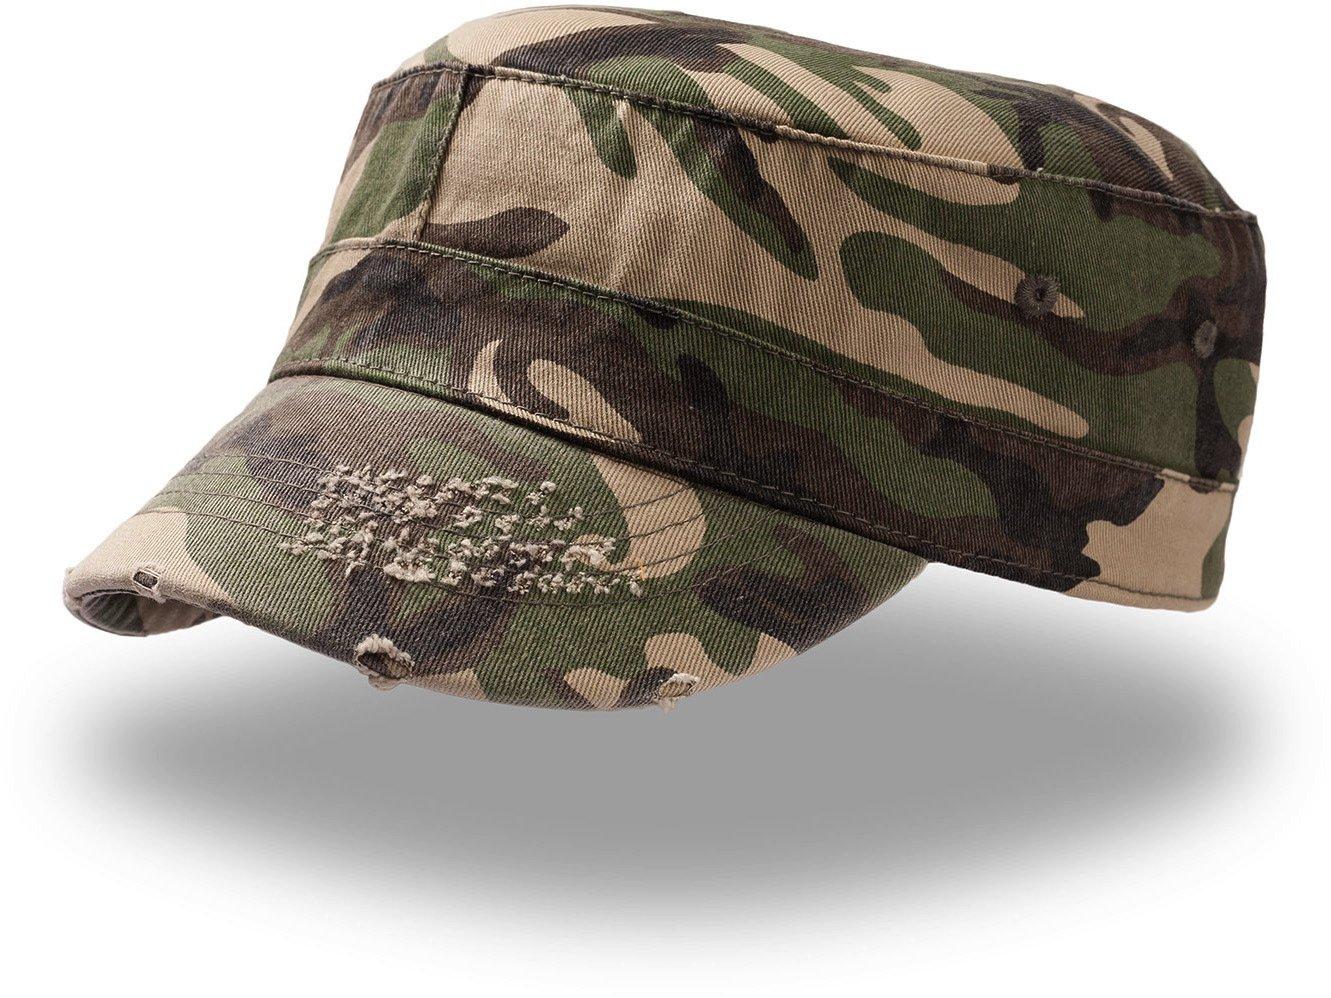 TANK CAMOUFLAGE BERRETTO MILITARE VASCO CAP CHAPEAUX 100% COTONE UNISEX  ATLANTIS 8437e2046d3f